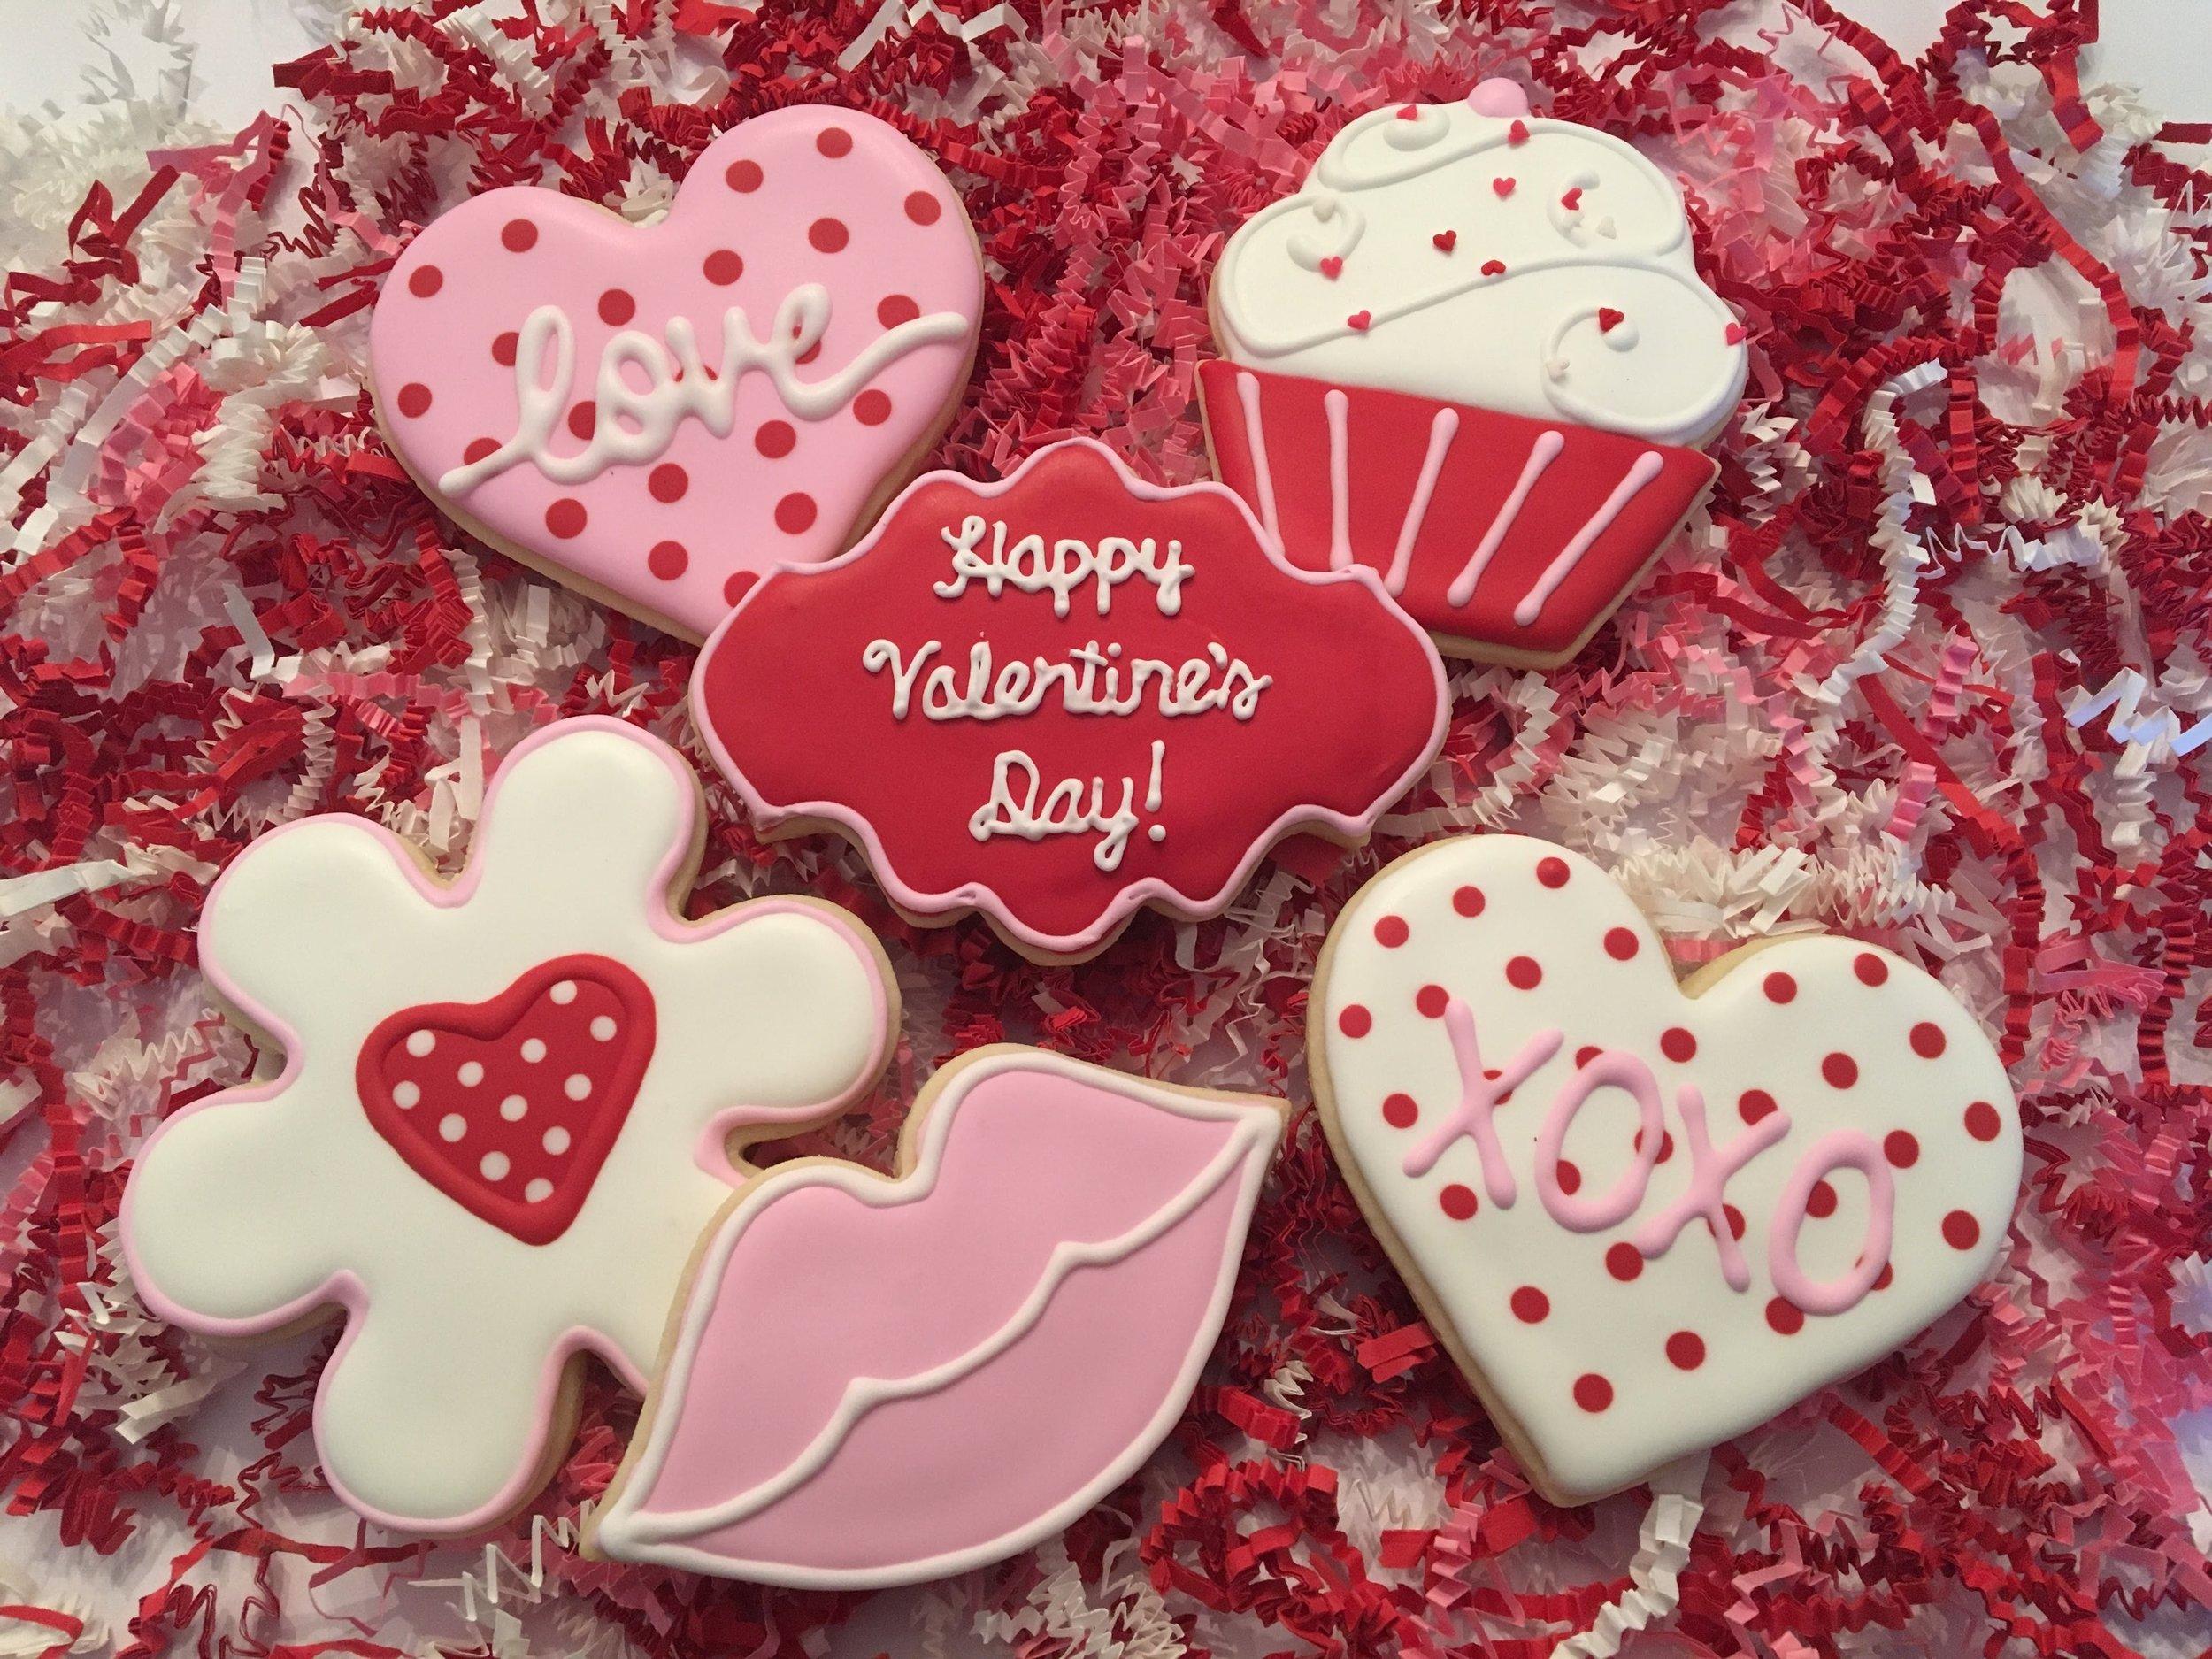 Valentine's Day Custom Sugar Cookies